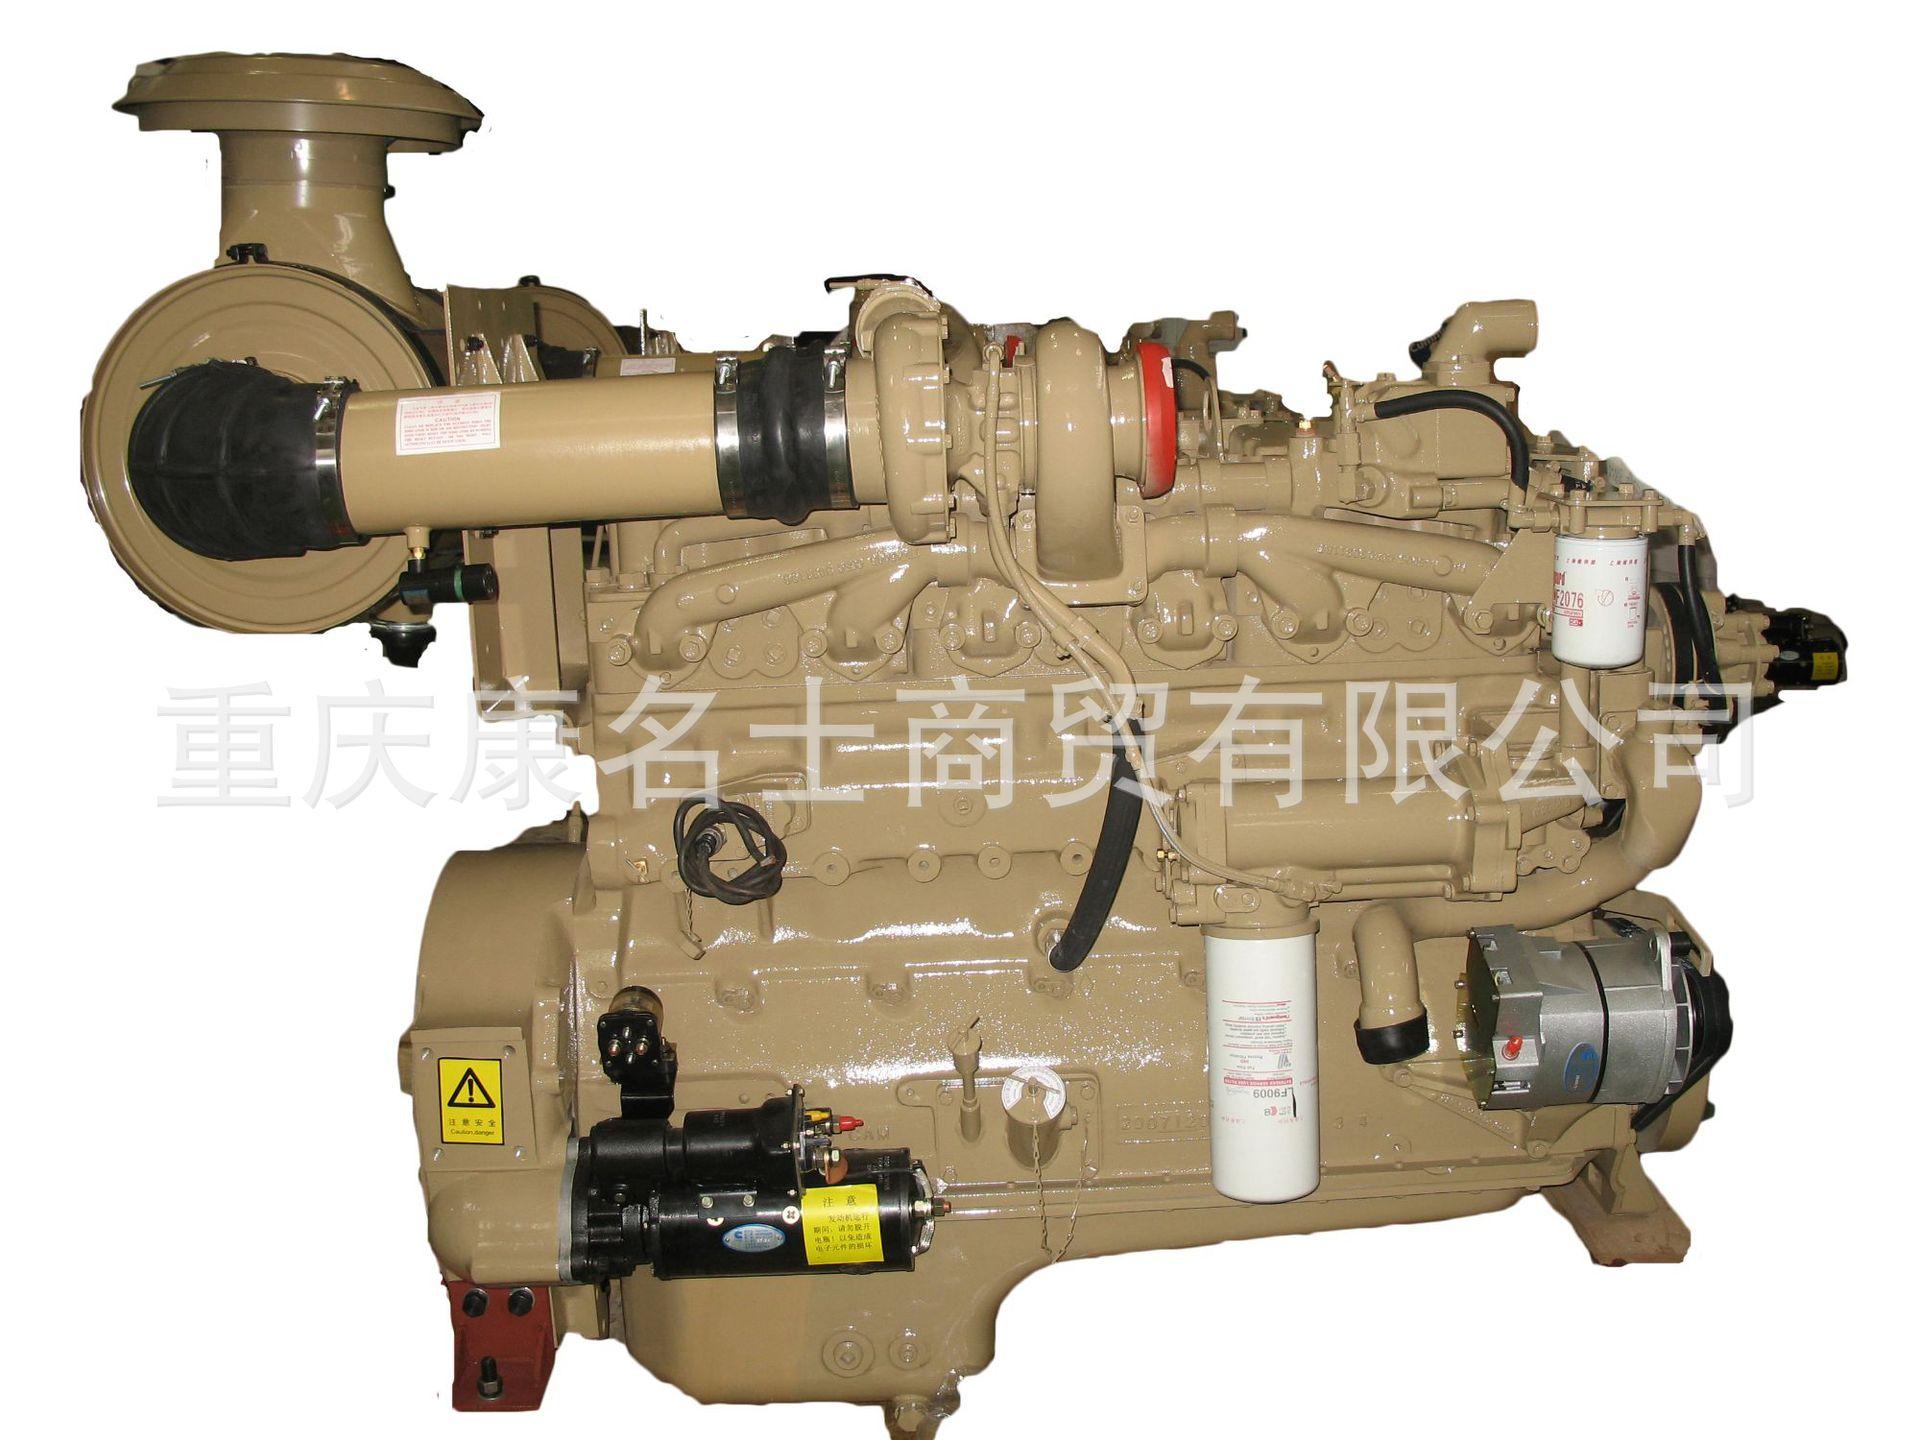 HX1145康明斯散热器NTA-855-G2发动机配件厂价优惠